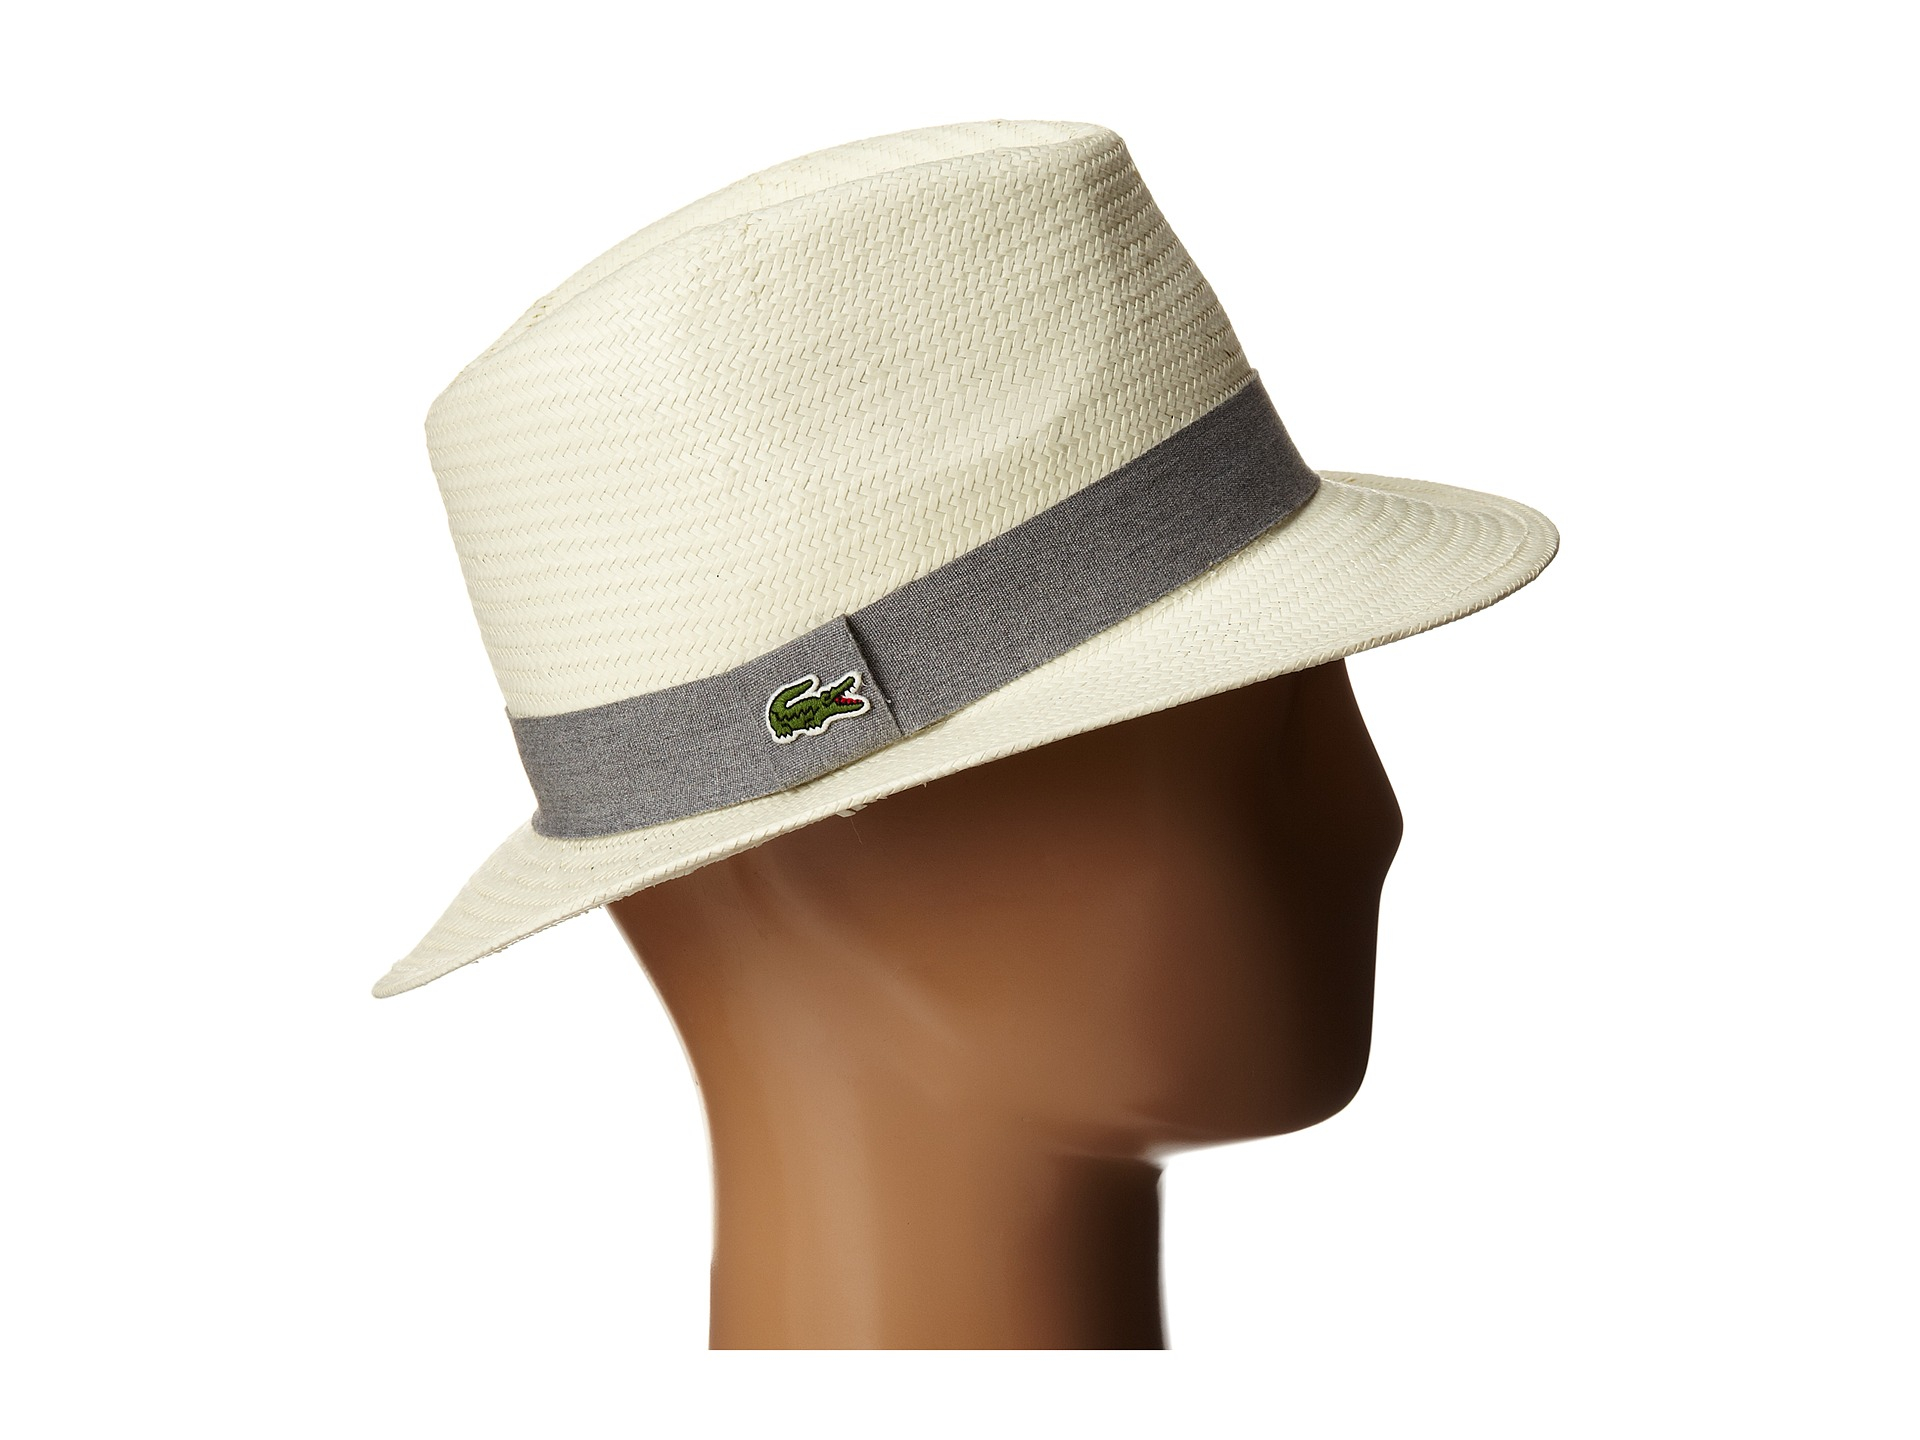 Lyst - Lacoste Straw Fedora Hat in Metallic 4a1dd112e2d